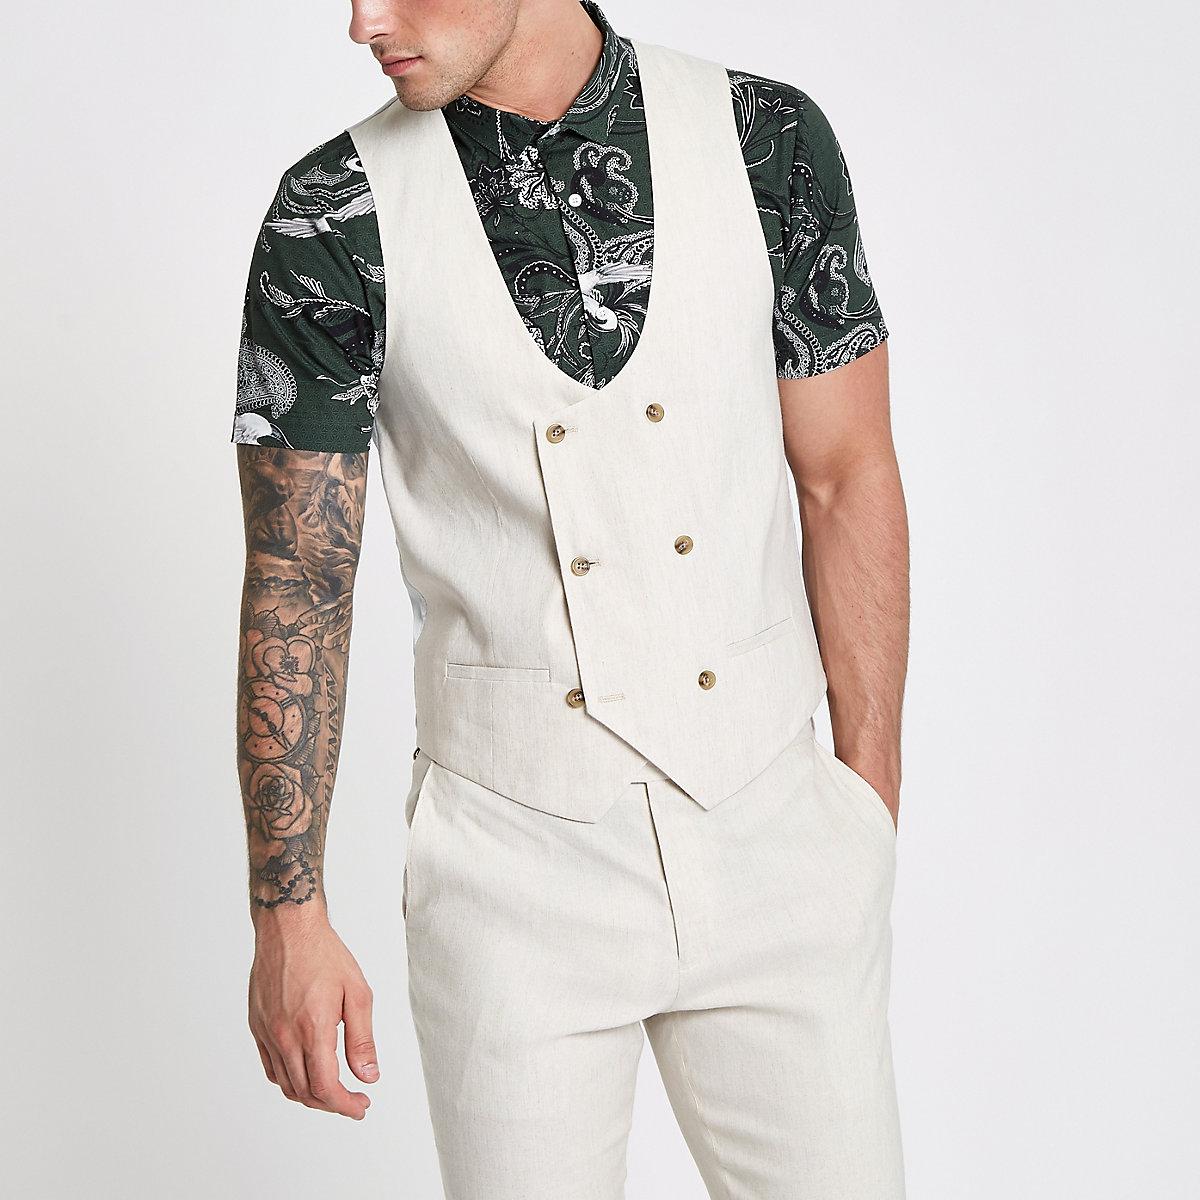 Cream linen blend double breasted vest